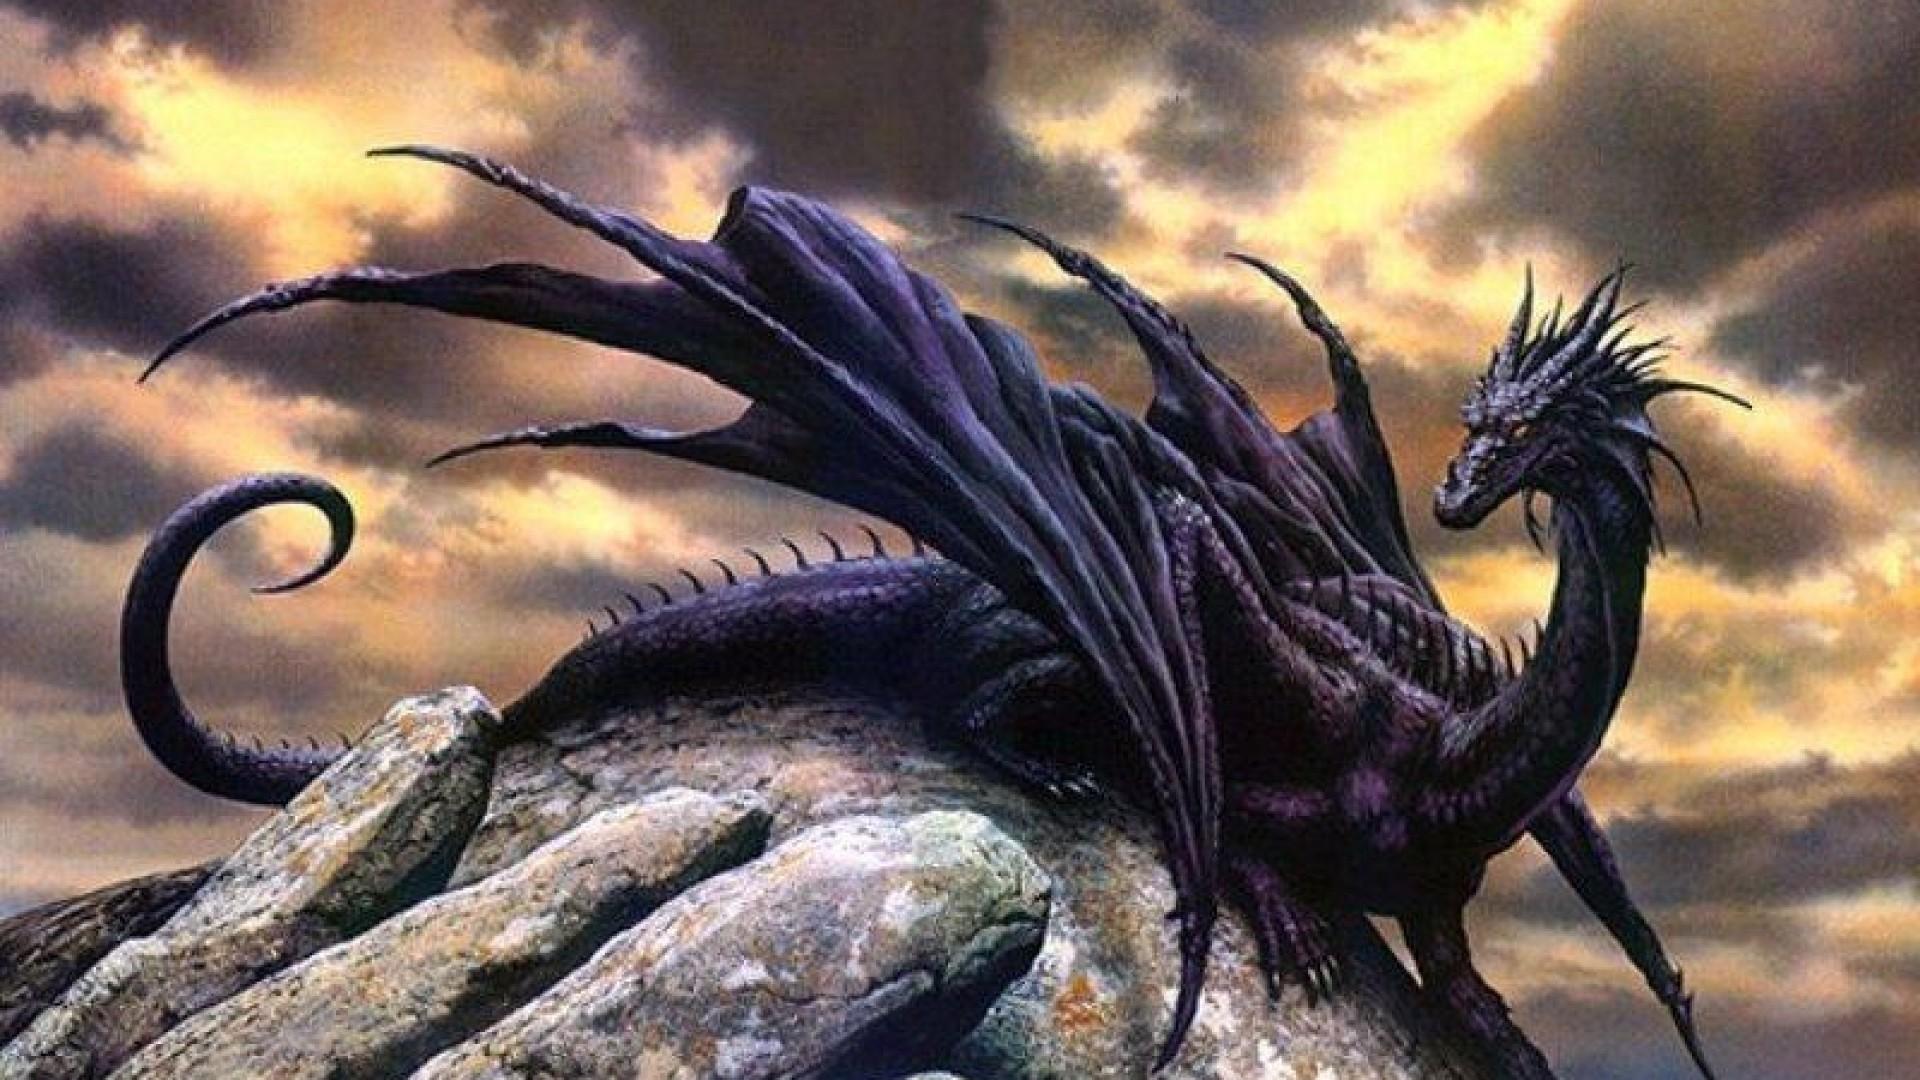 High Resolution Fantasy Black Dragon Wallpaper Hd Full Size 1920x1080